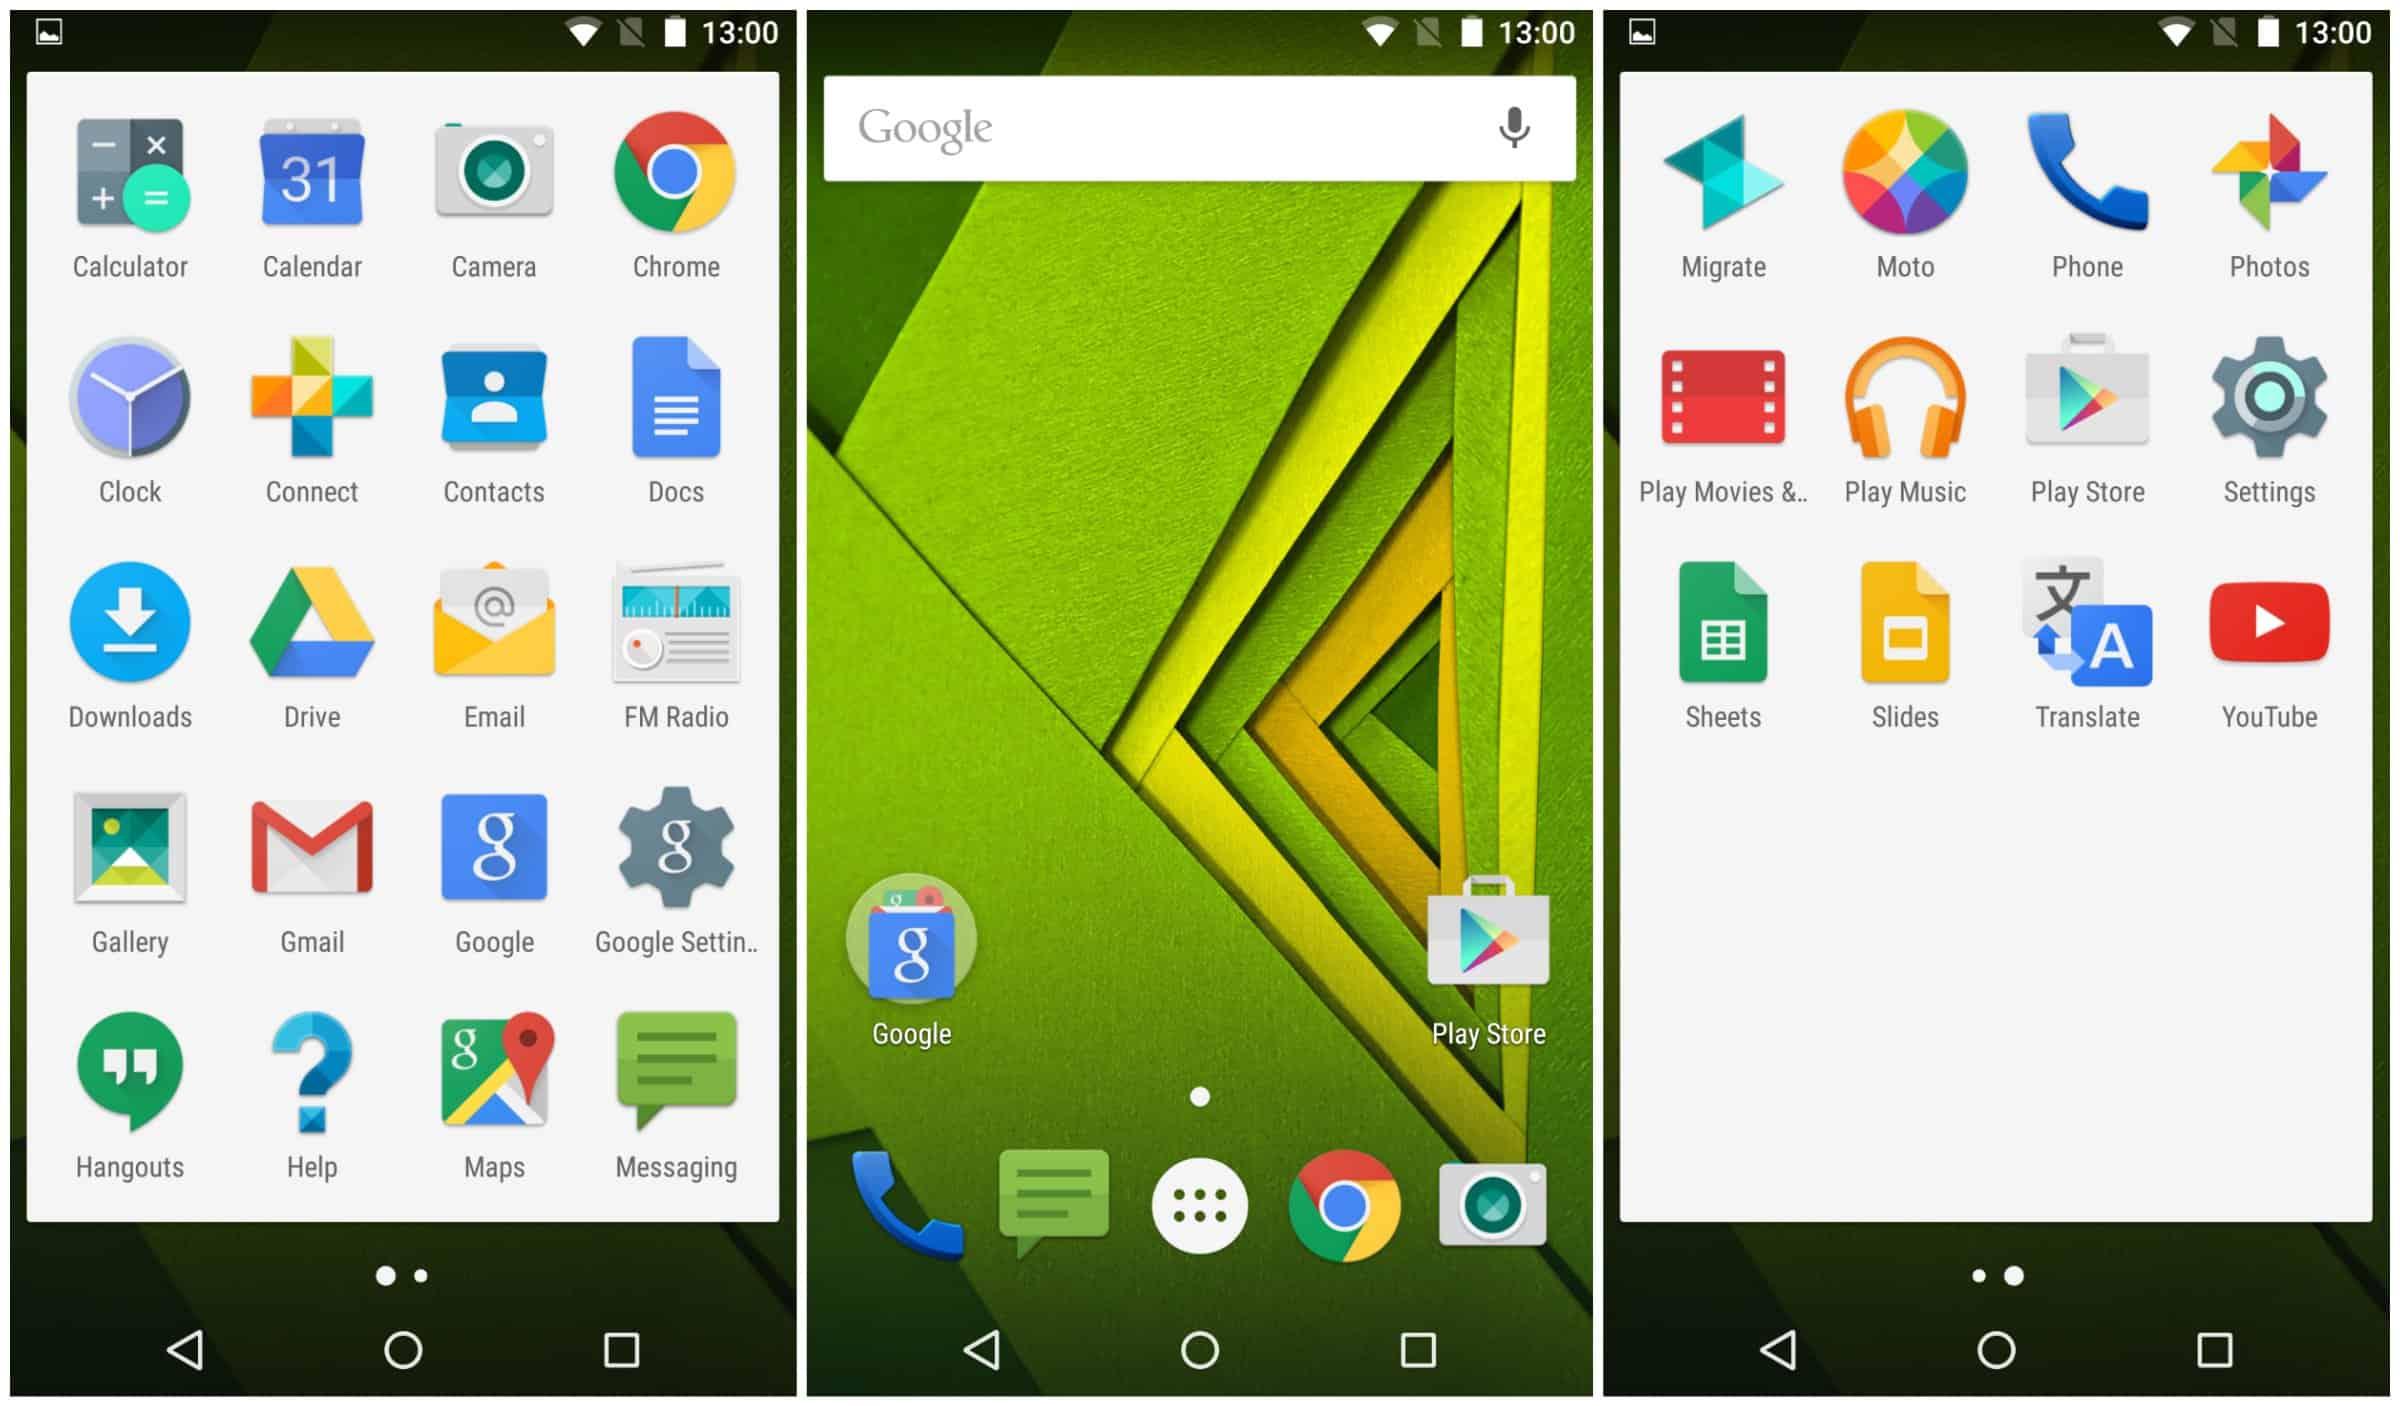 Moto X apps screen